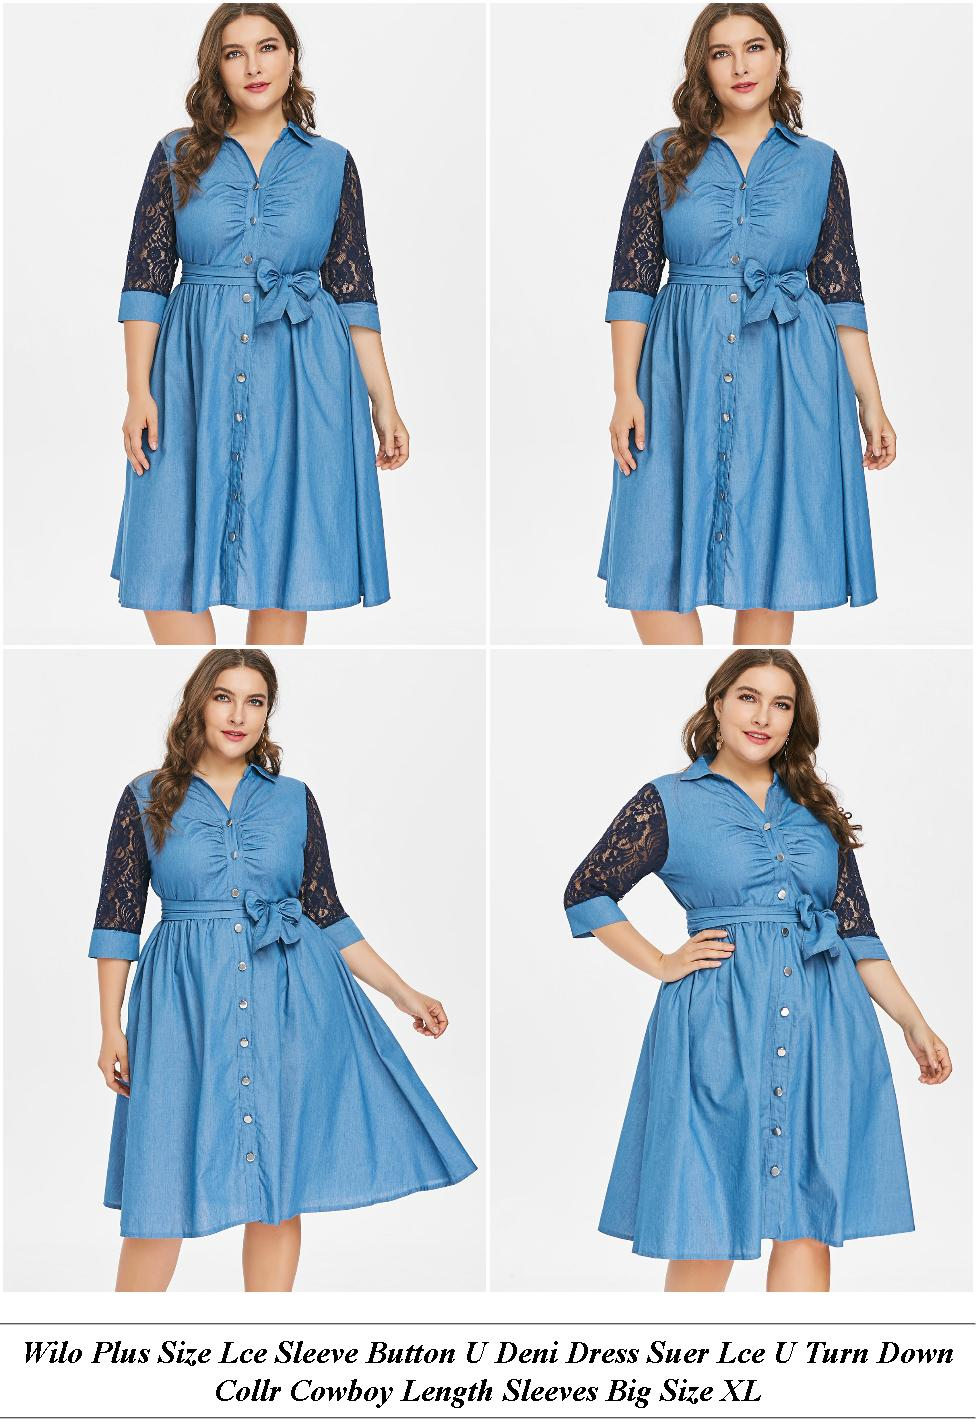 Maxi Dresses - Converse Uk Sale - Sweater Dress - Very Cheap Clothes Uk